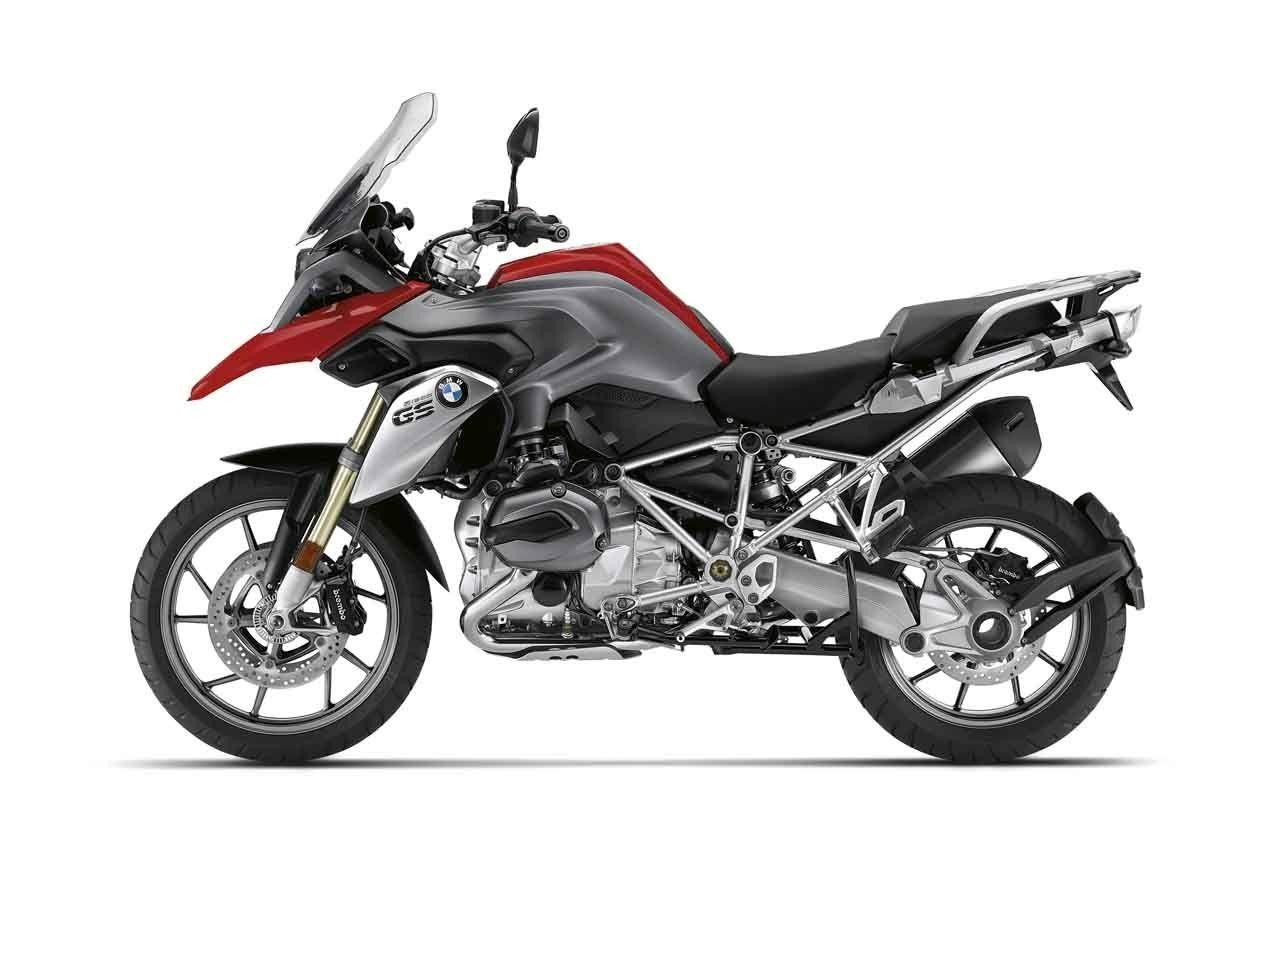 Motorrad Mieten & Roller Mieten BMW R 1200 GS ABS extra tief